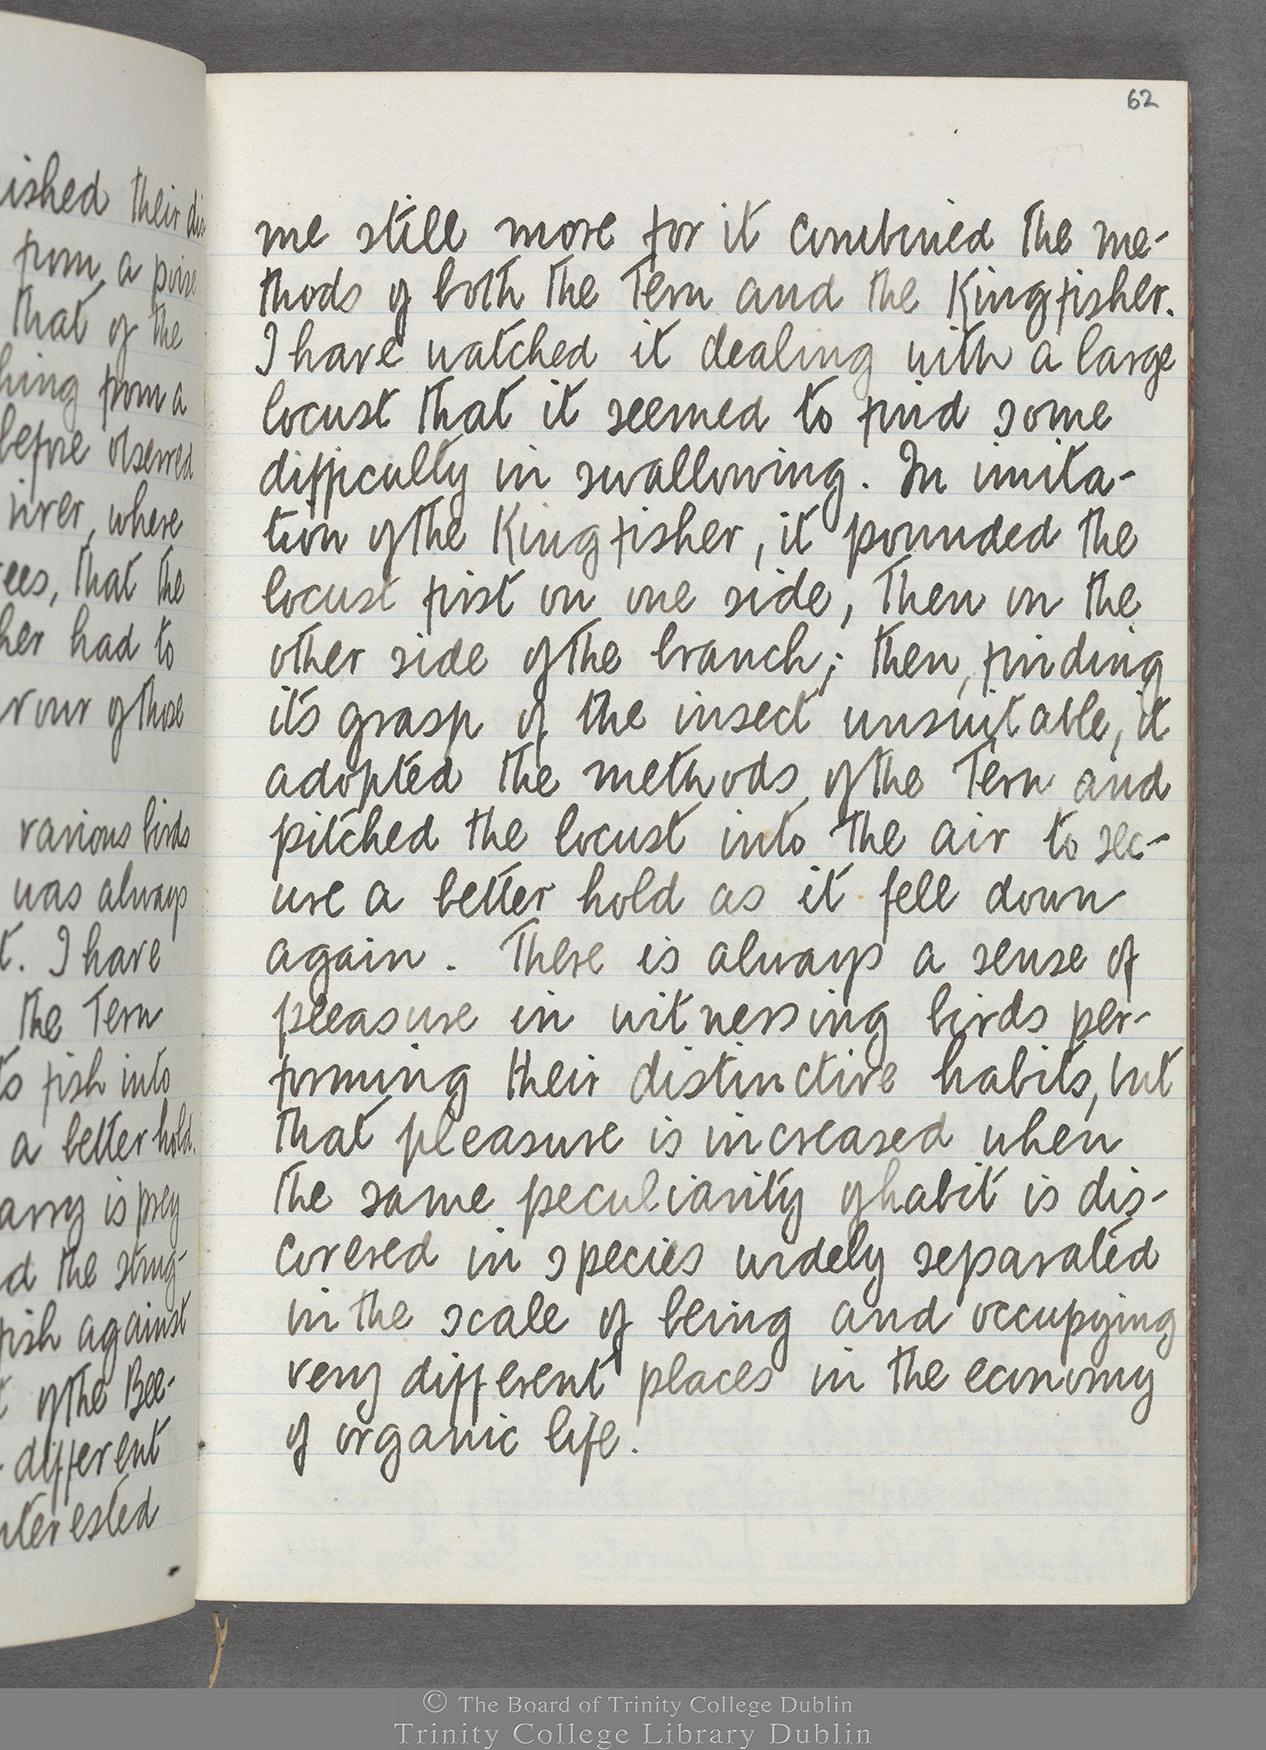 TCD MS 10516 folio 62 recto